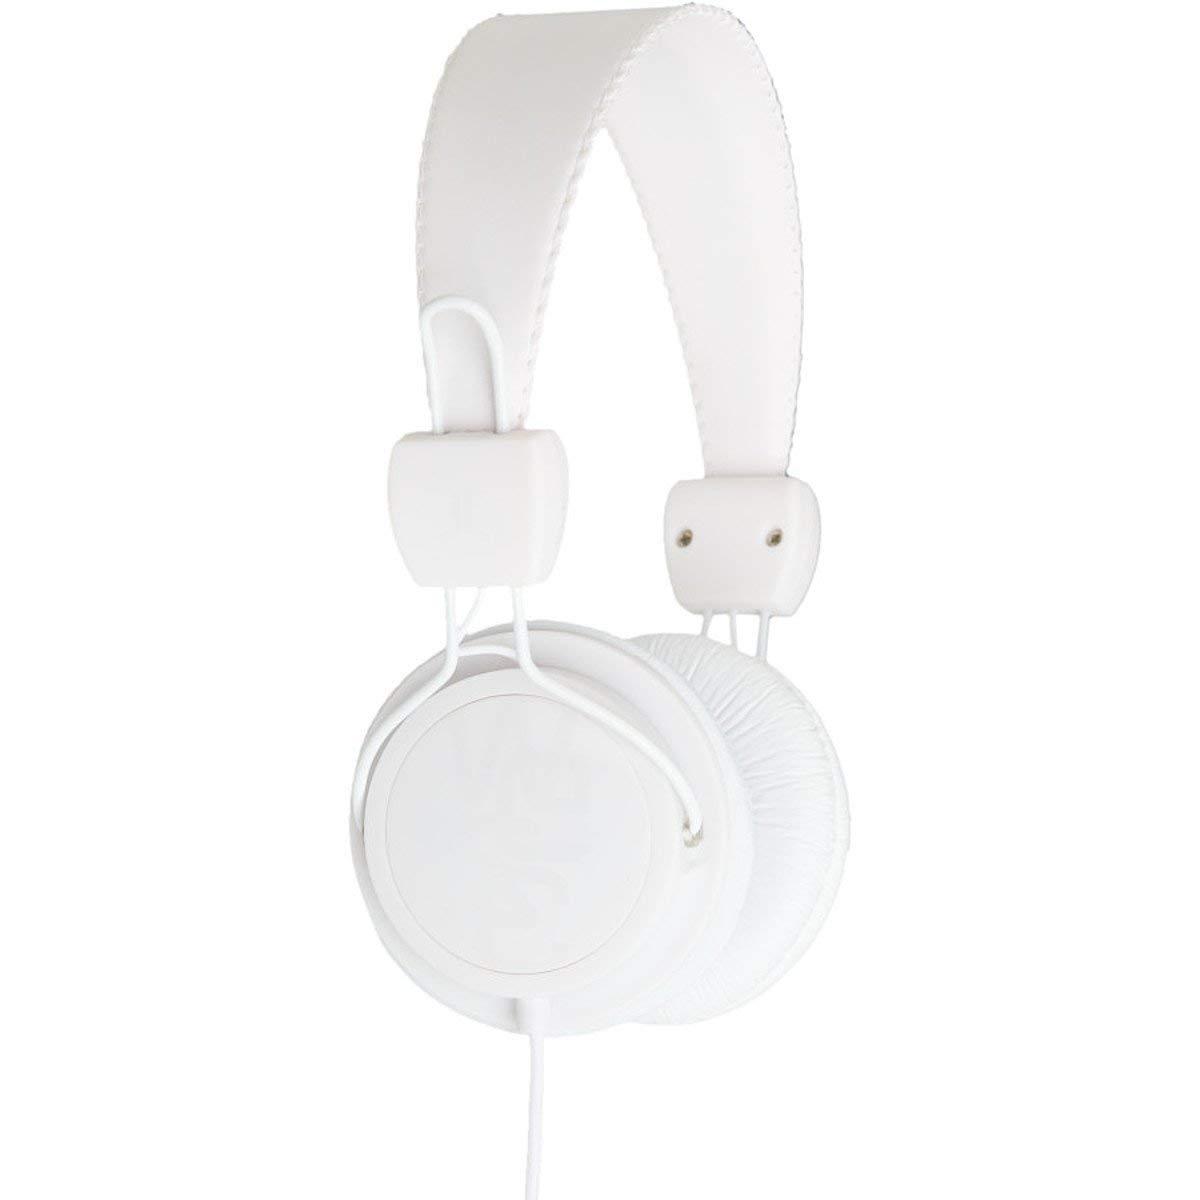 WESC 0007001001 Matte Conga Headphones with Volume Control, White